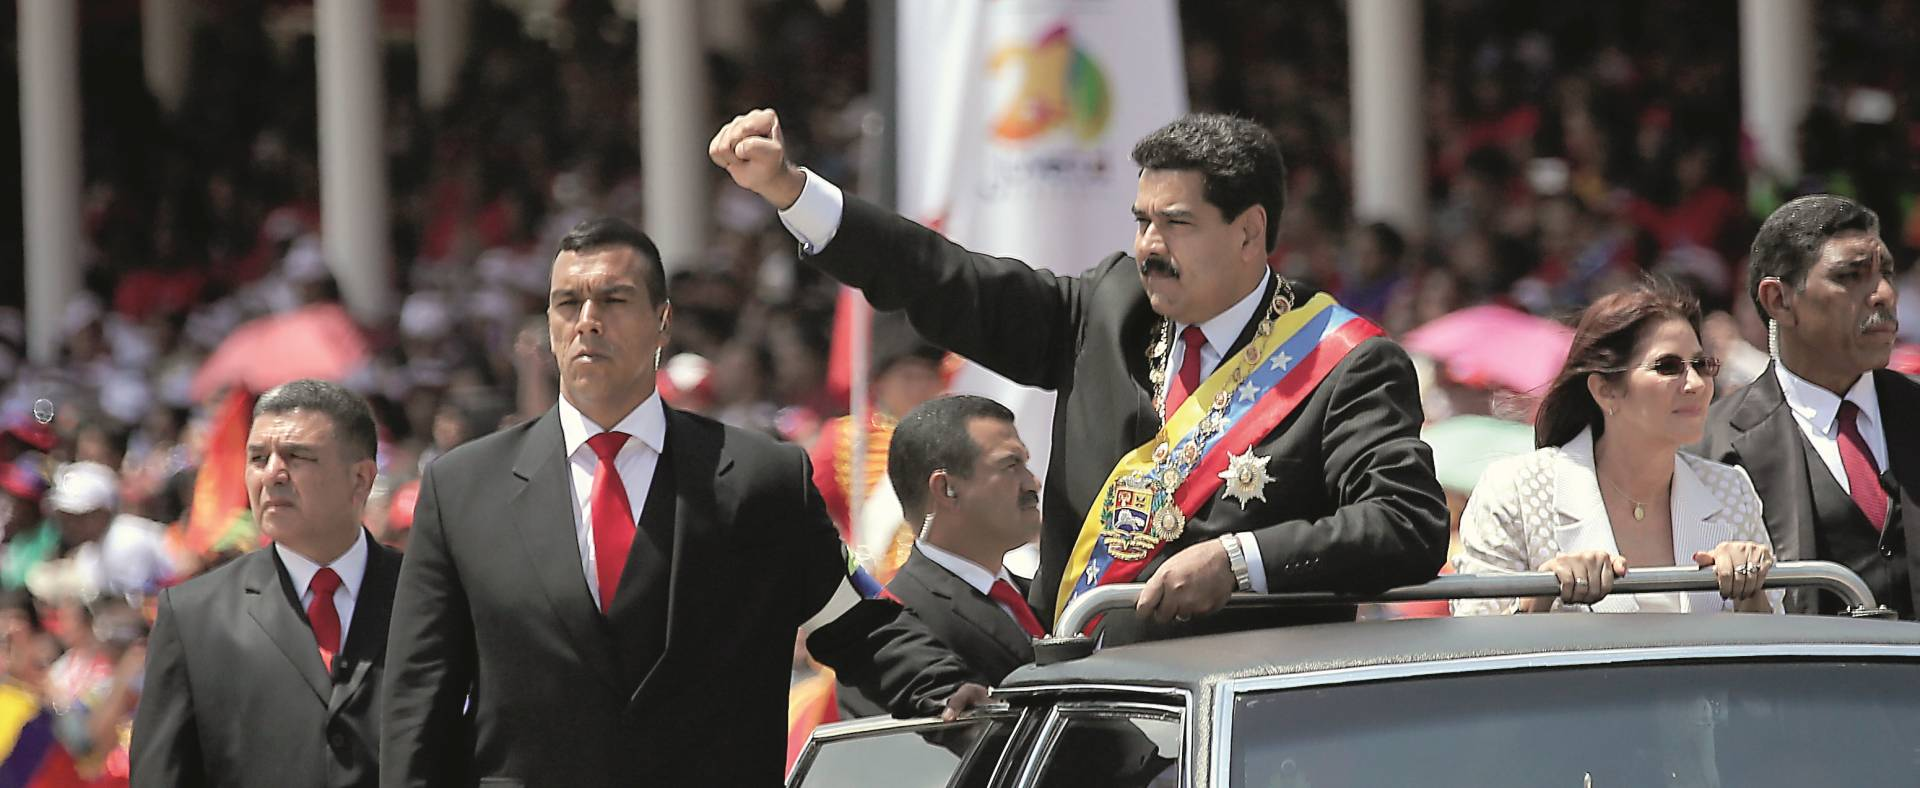 Trumpova administracija razmatrala vojni udar u Venezueli